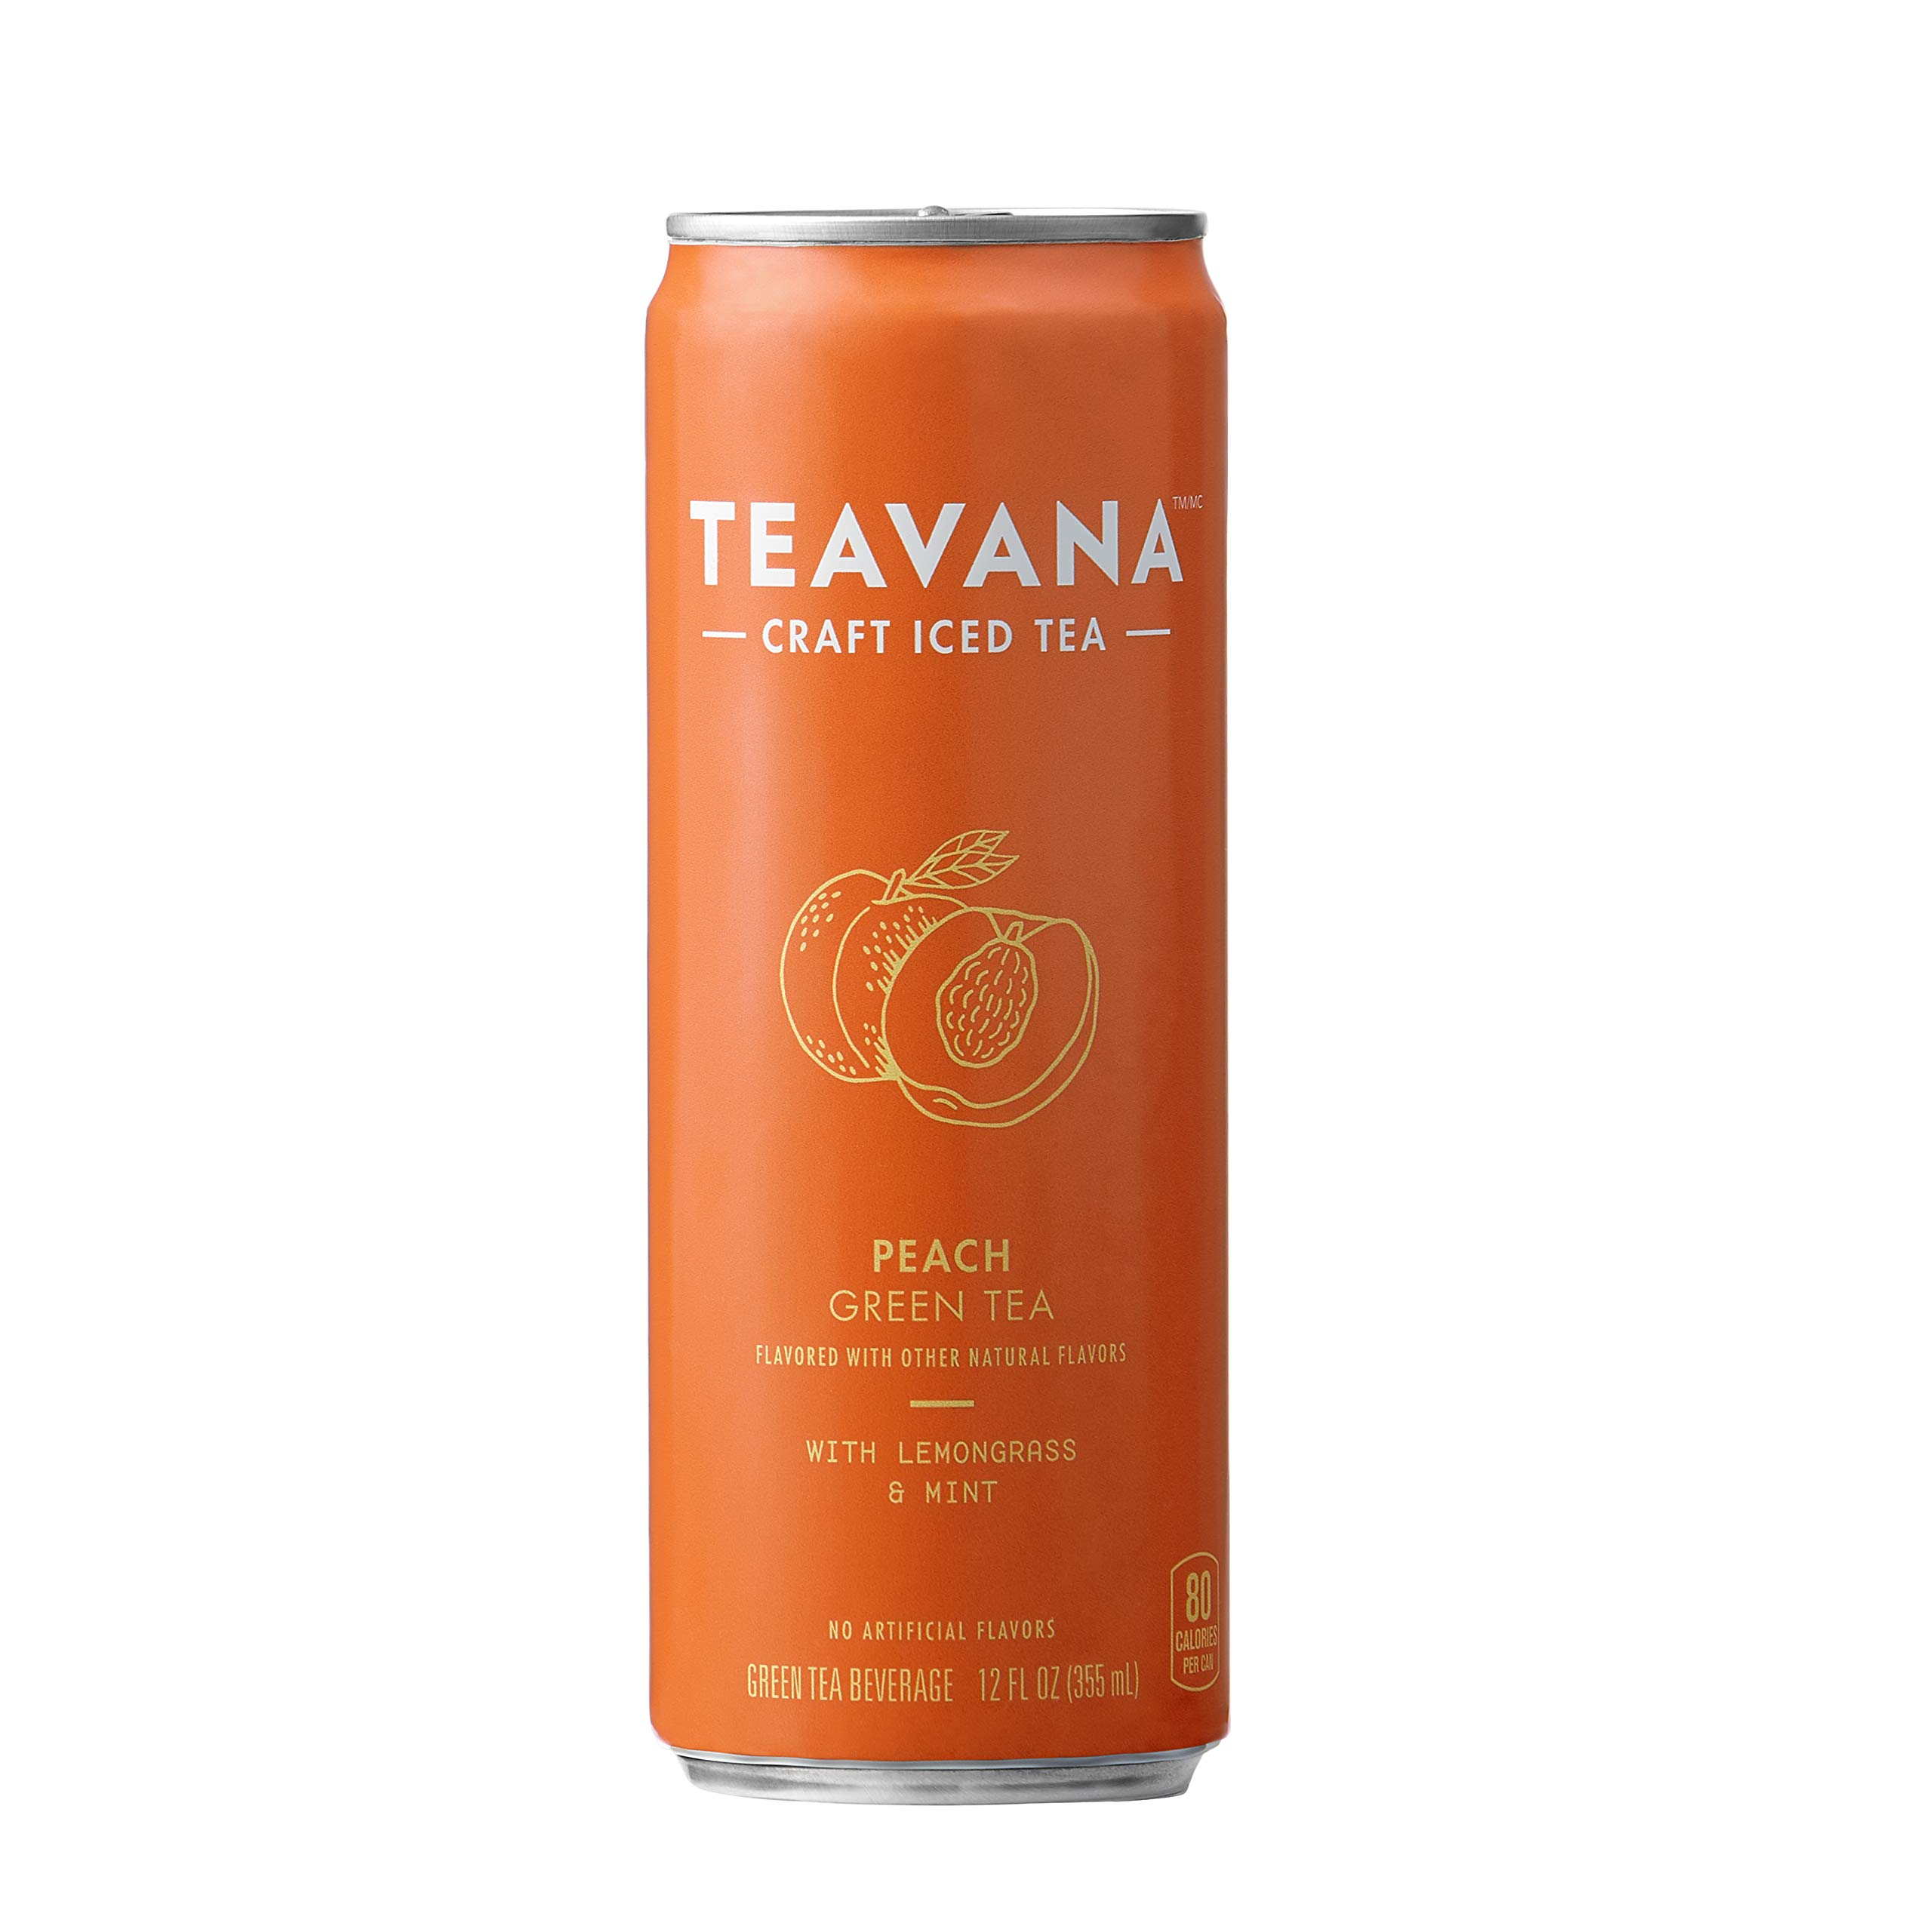 Teavana Craft Iced Tea, Peach Green Tea, 12 fl. oz. Cans (Pack of 12)